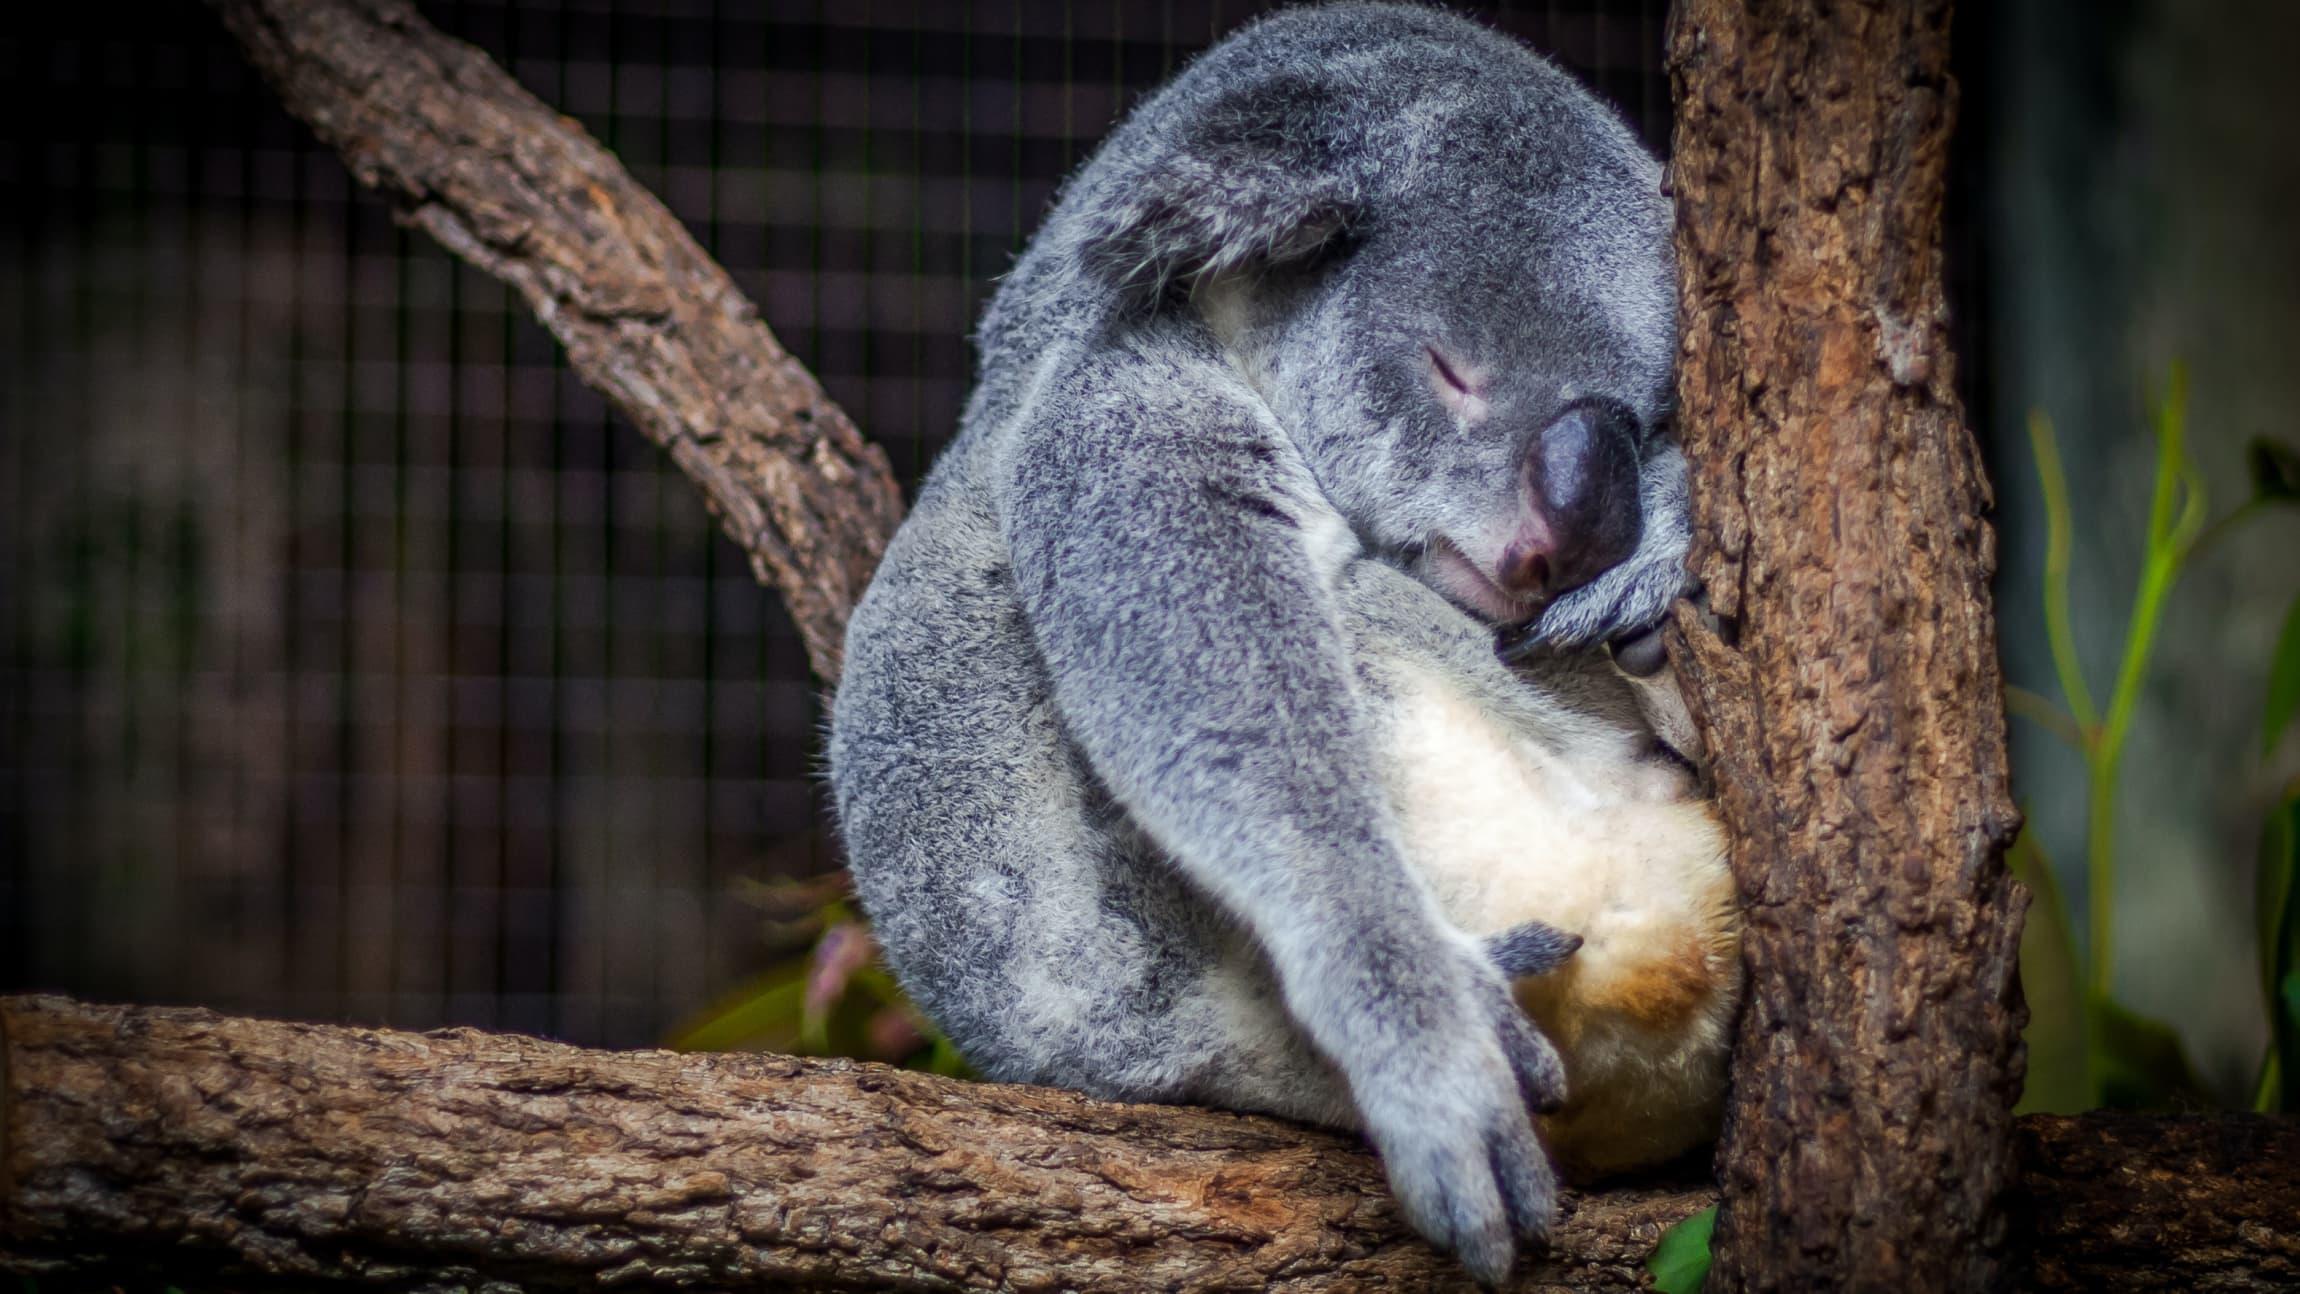 Koala sleeping on tree branch.